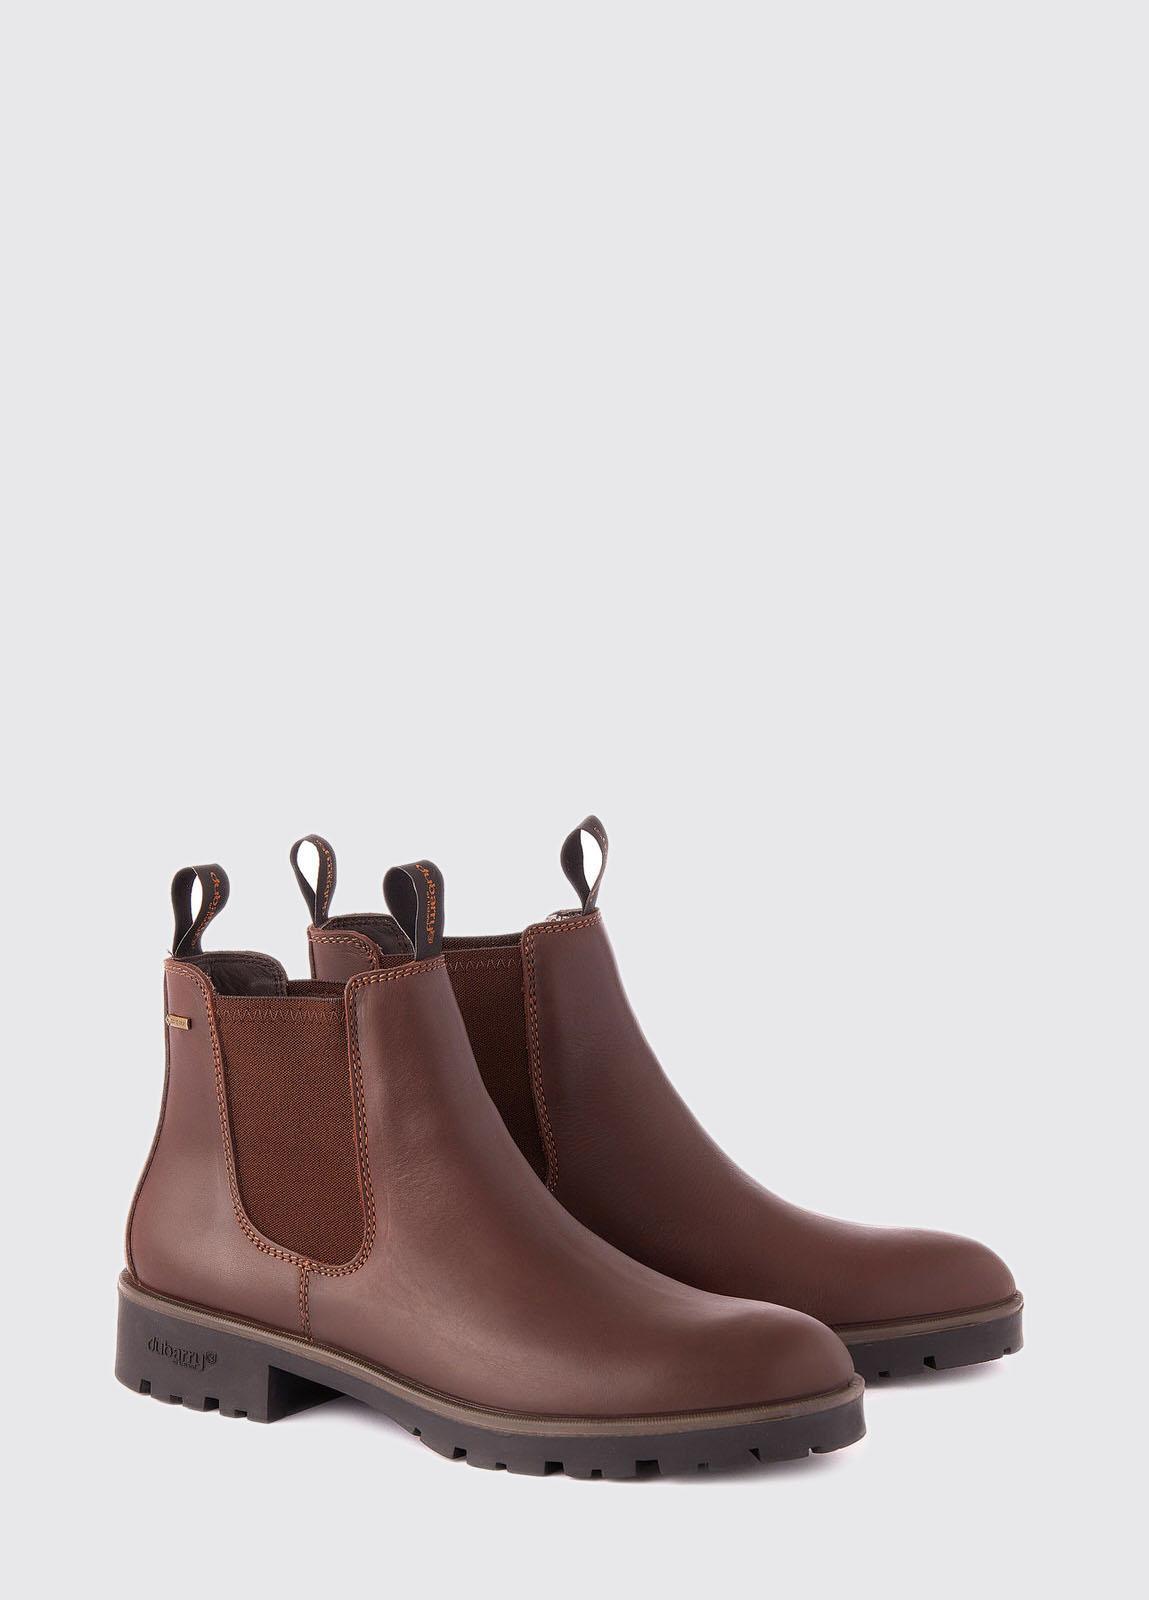 Antrim Country Boot - Mahogany